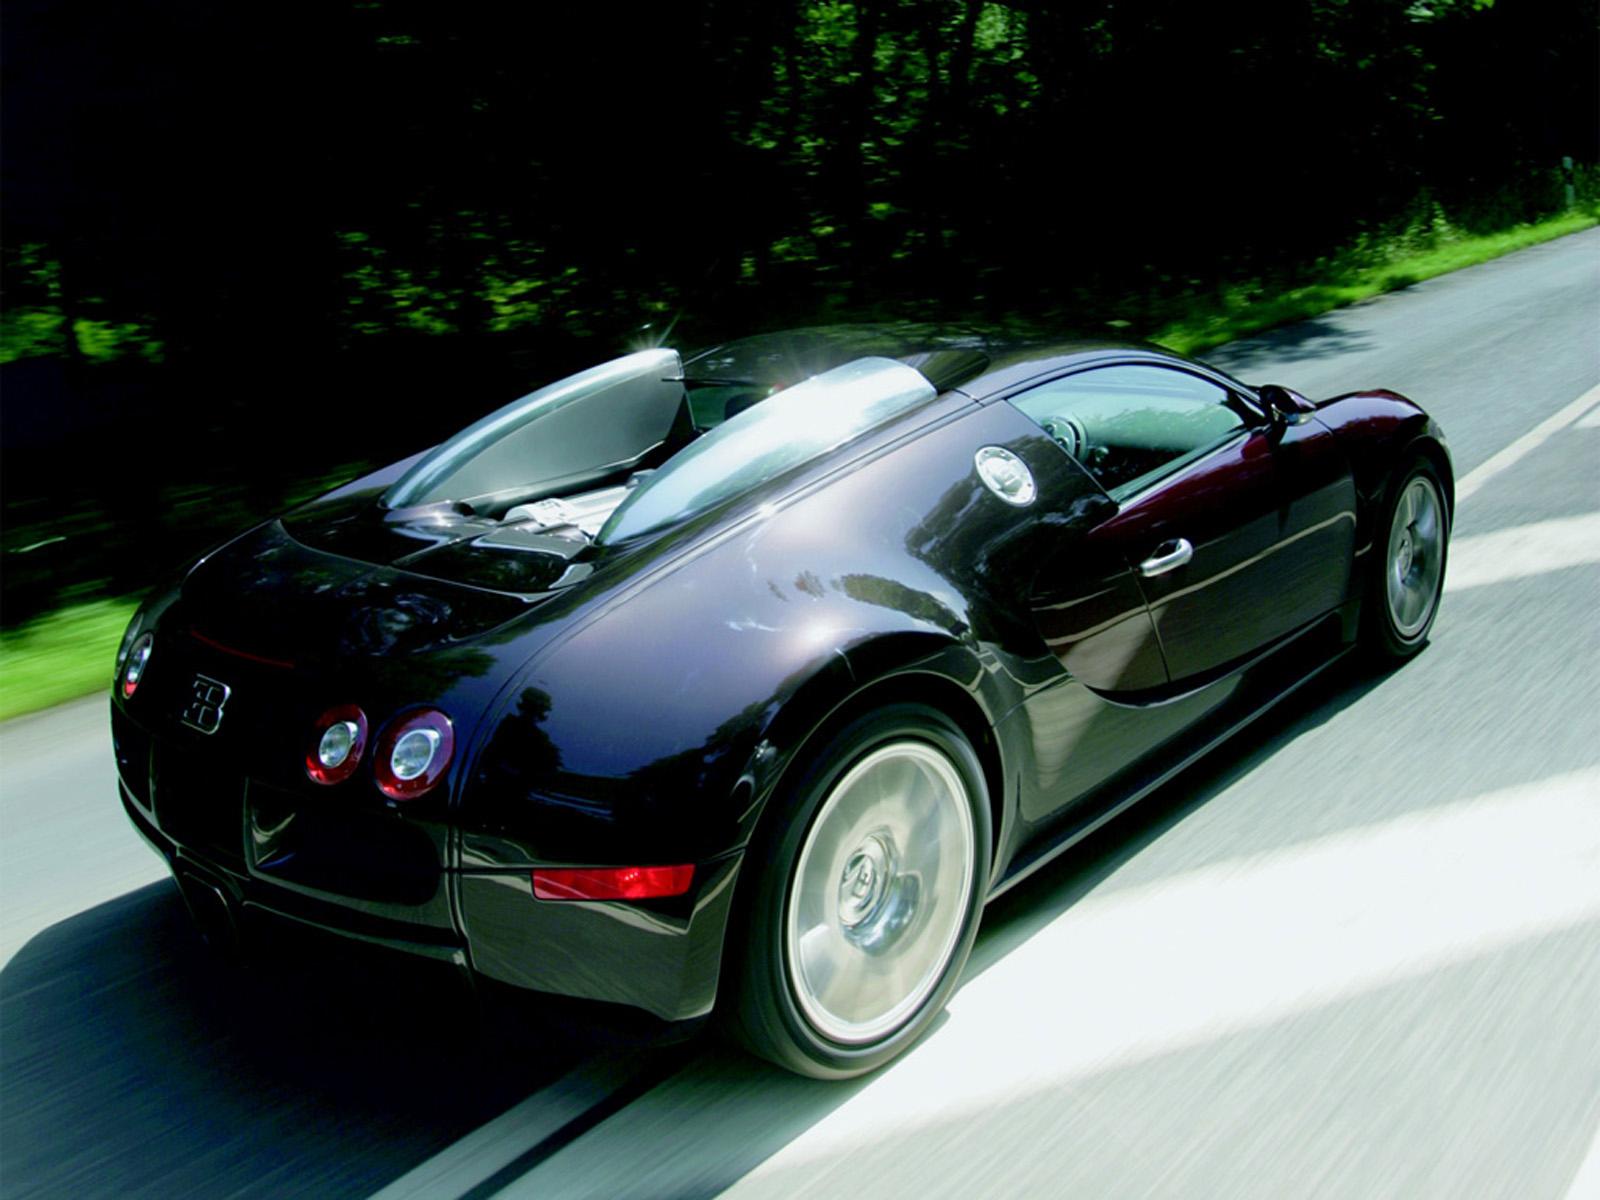 Bugatti+Veyron+%25285%2529 Amazing Bugatti Veyron Price In Australia Cars Trend